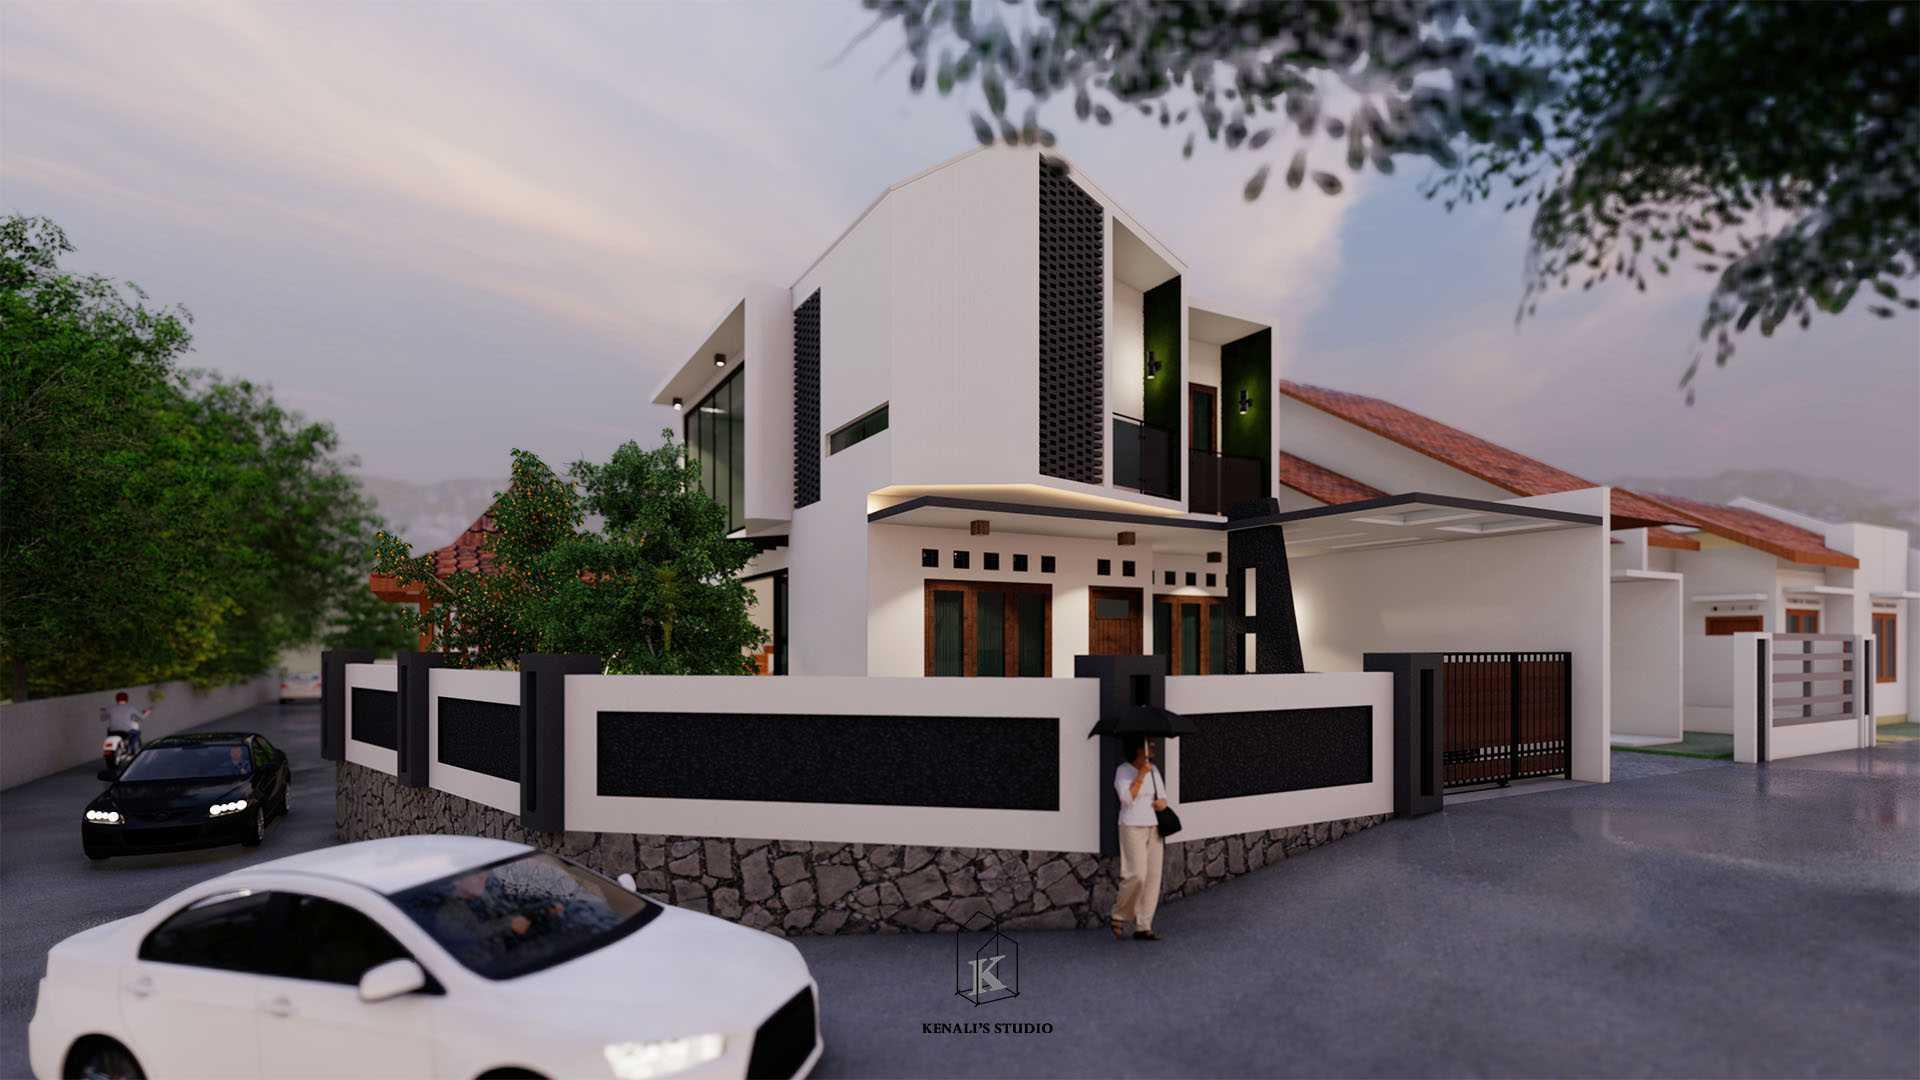 Kenali's Studio Yr - House Kec. Serpong, Kota Tangerang Selatan, Banten, Indonesia Kec. Serpong, Kota Tangerang Selatan, Banten, Indonesia Kenalis-Studio-Yr-House Contemporary  93640